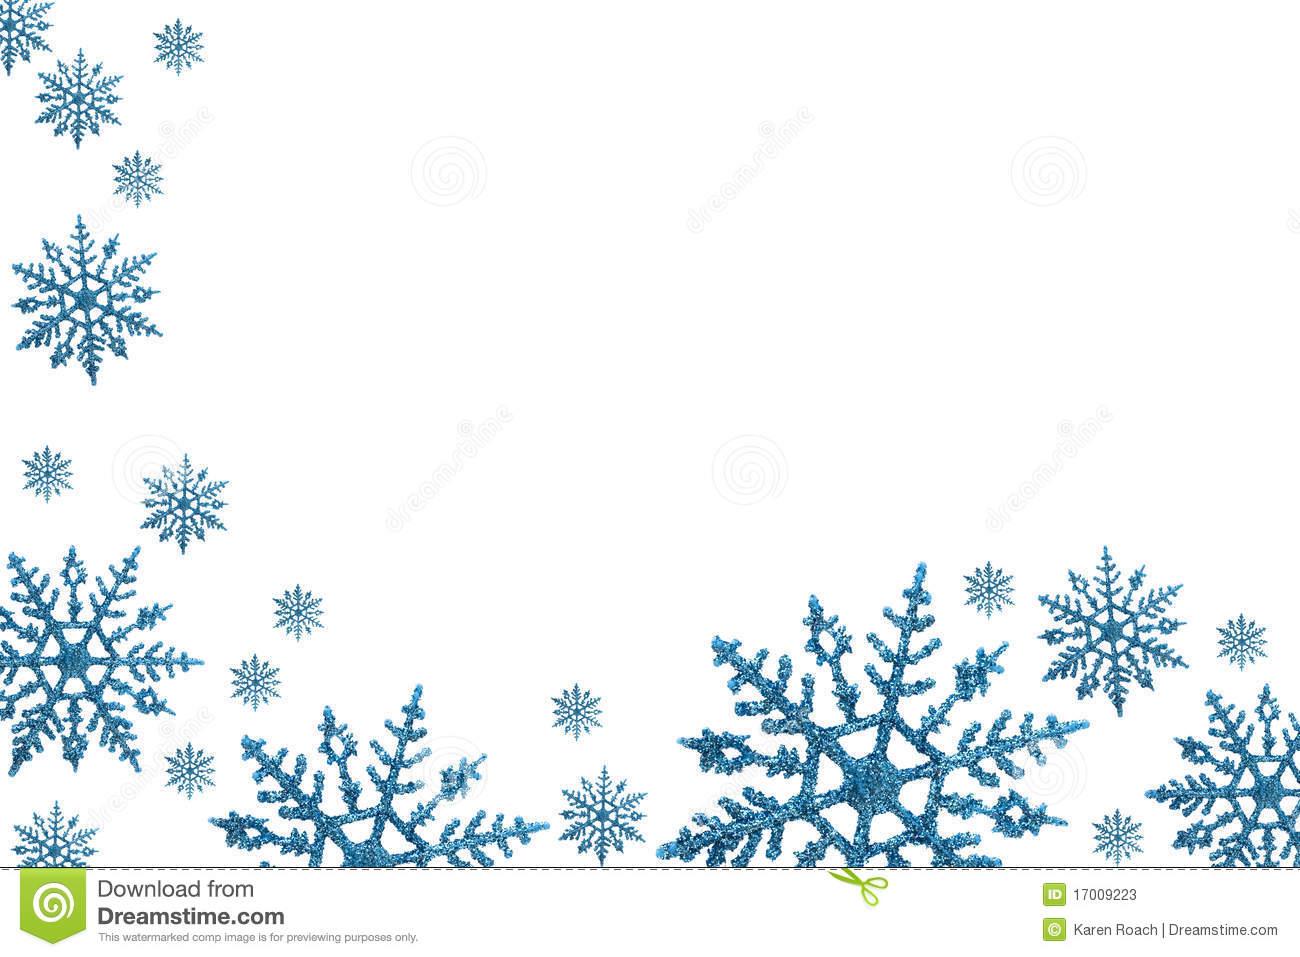 Winter Borders Clipart-Winter Borders Clipart-8